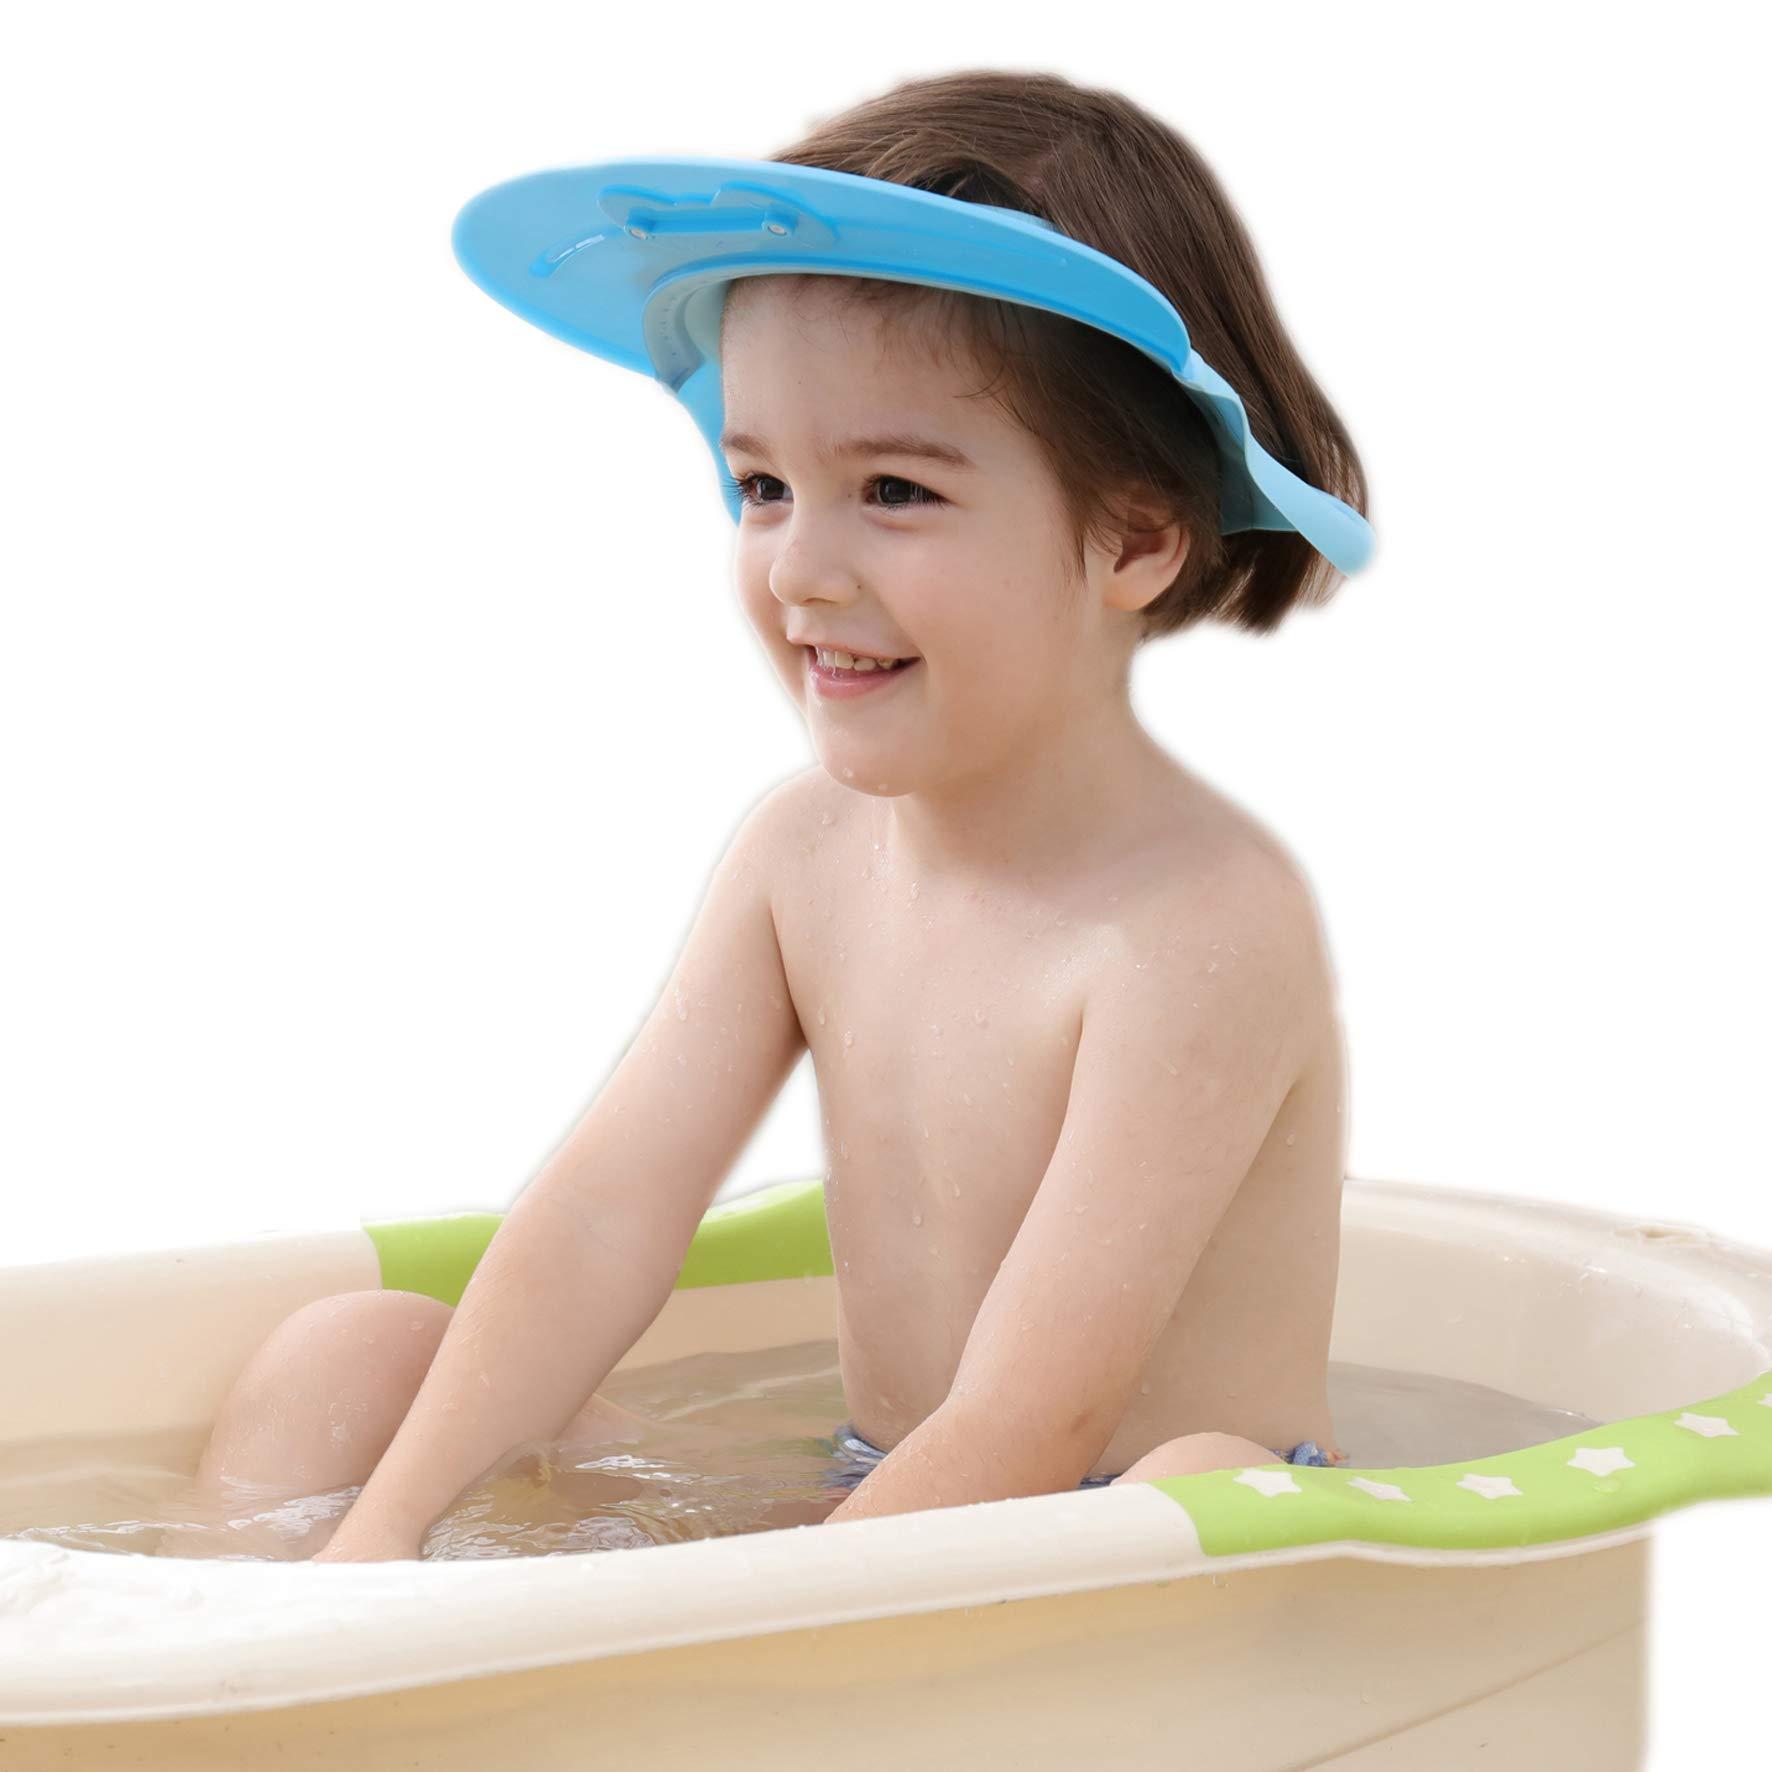 Baby Shampoo Shower Cap Bath wash Visor Adjustable Bathing tub Head Hair Rinser Shield hat Protection Kids and Toddler (Blue)